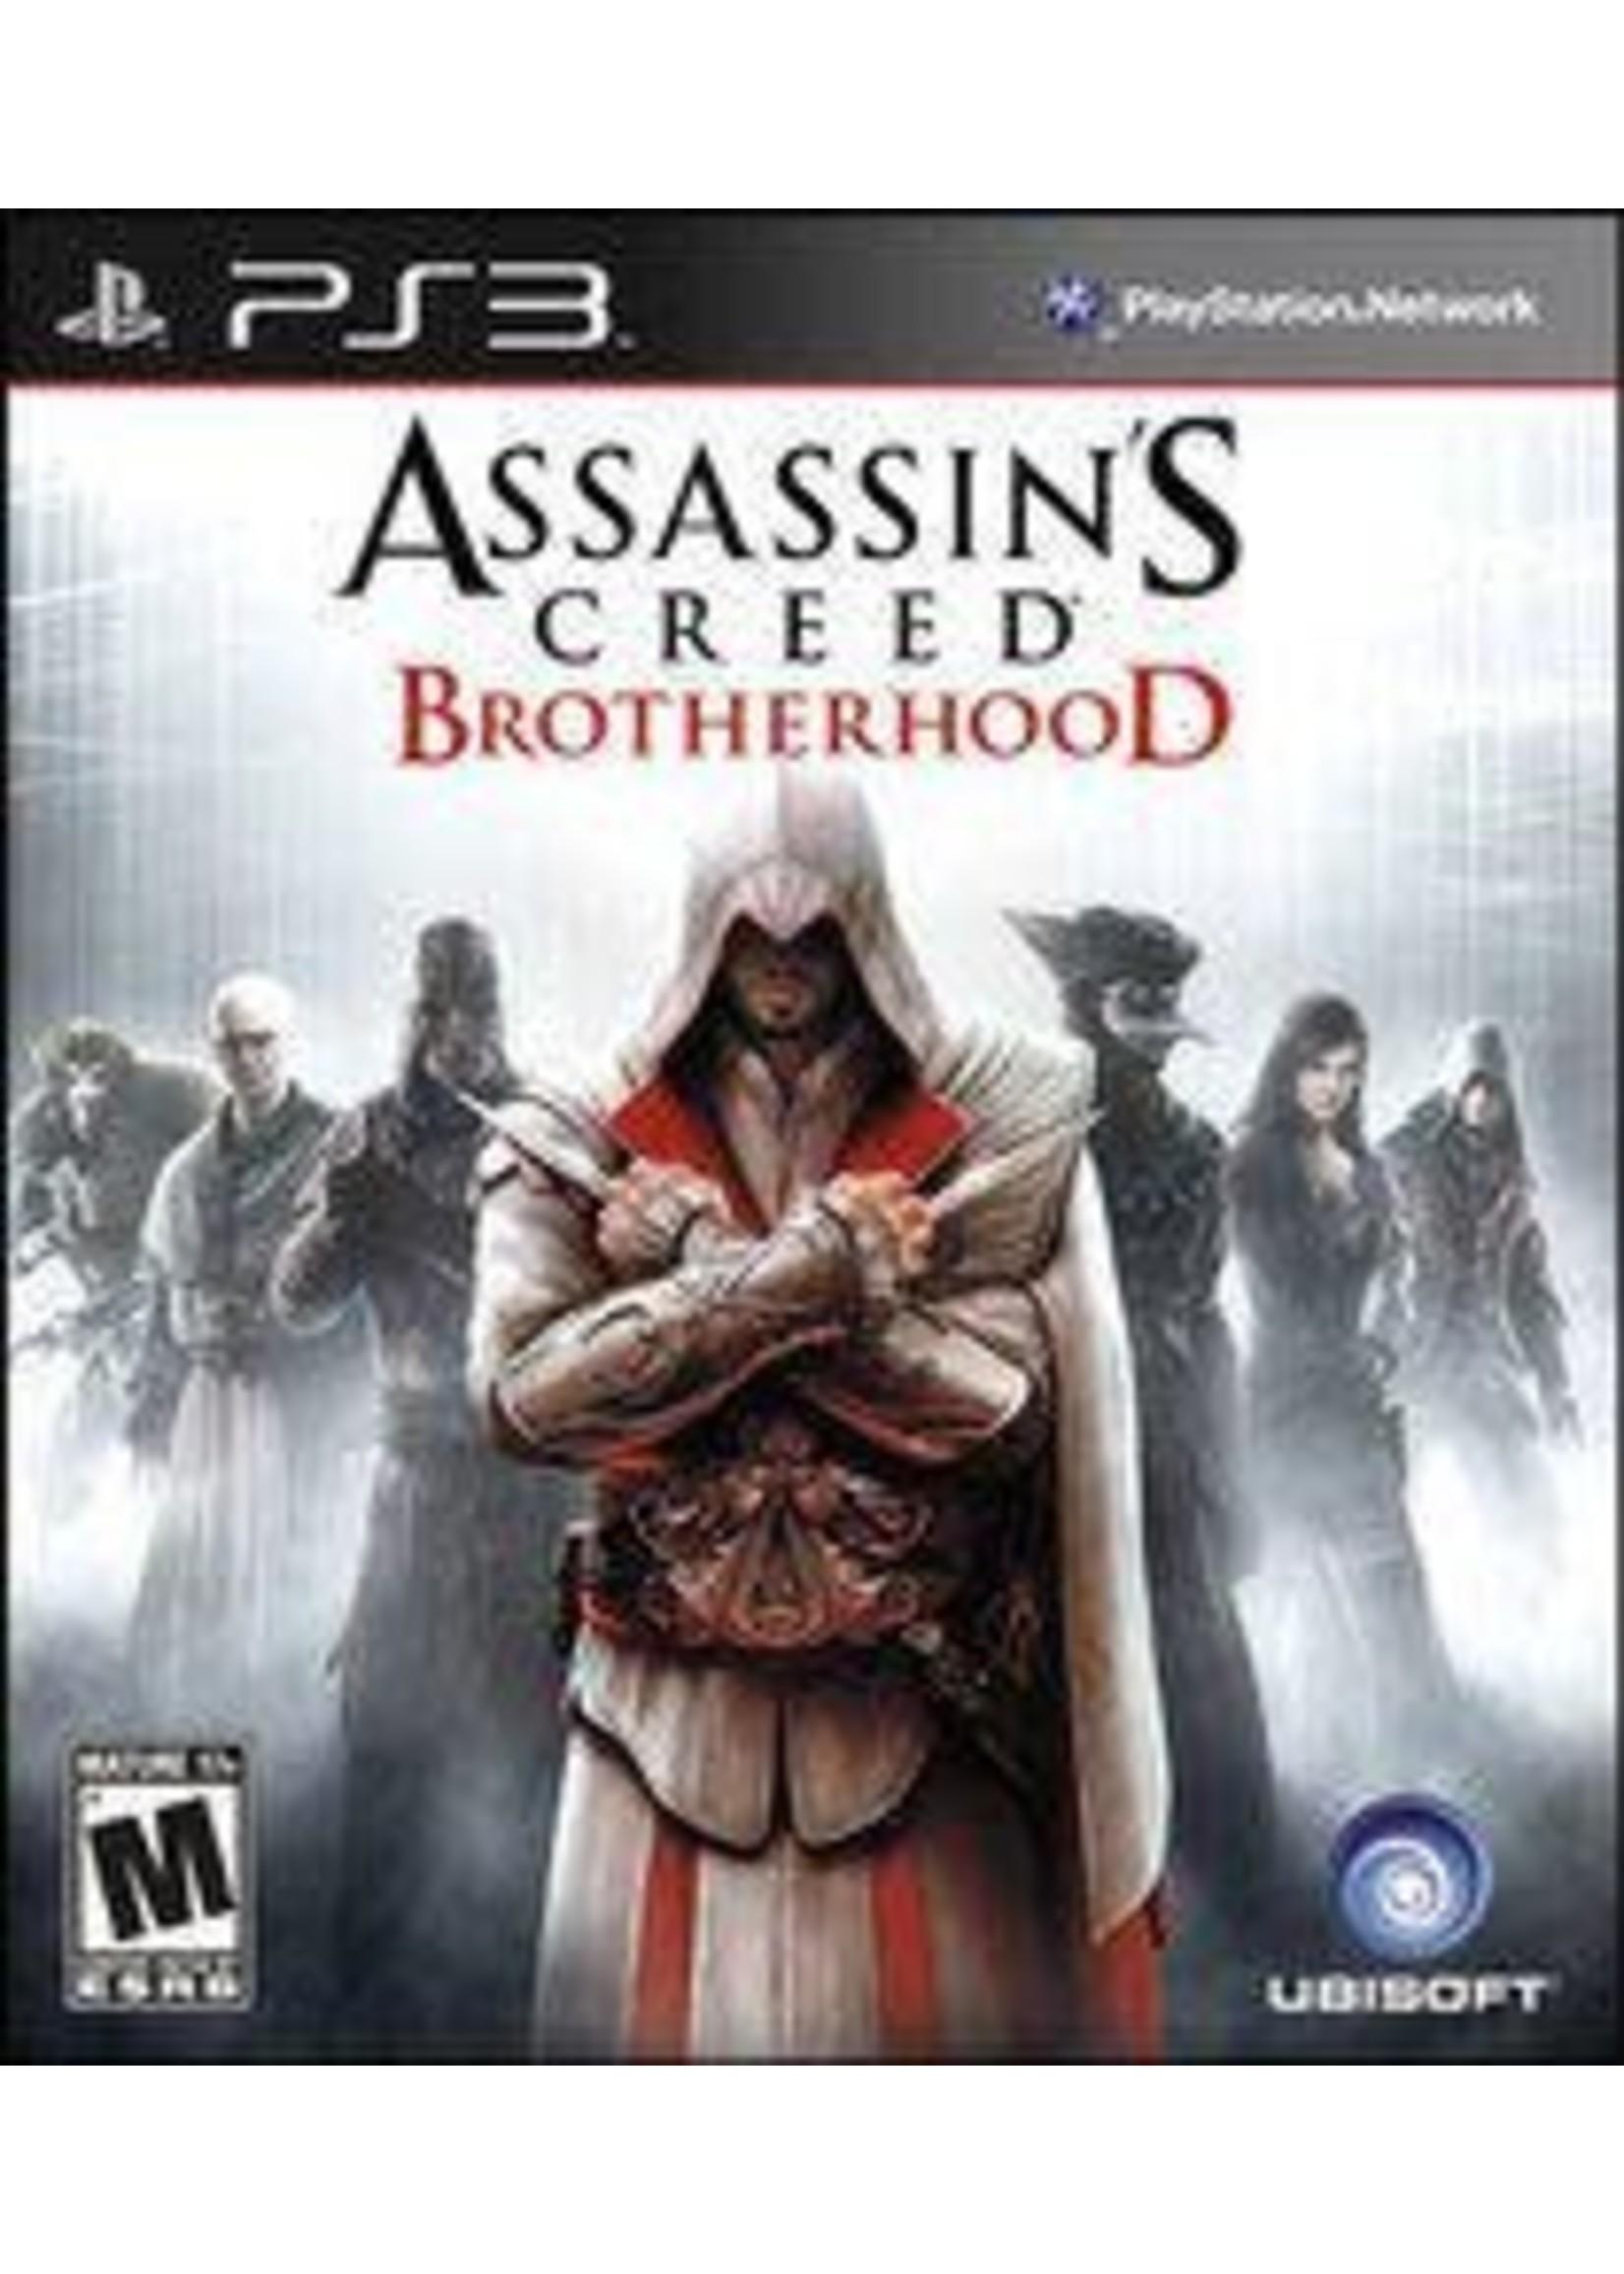 Assassin's Creed: Brotherhood Playstation 3